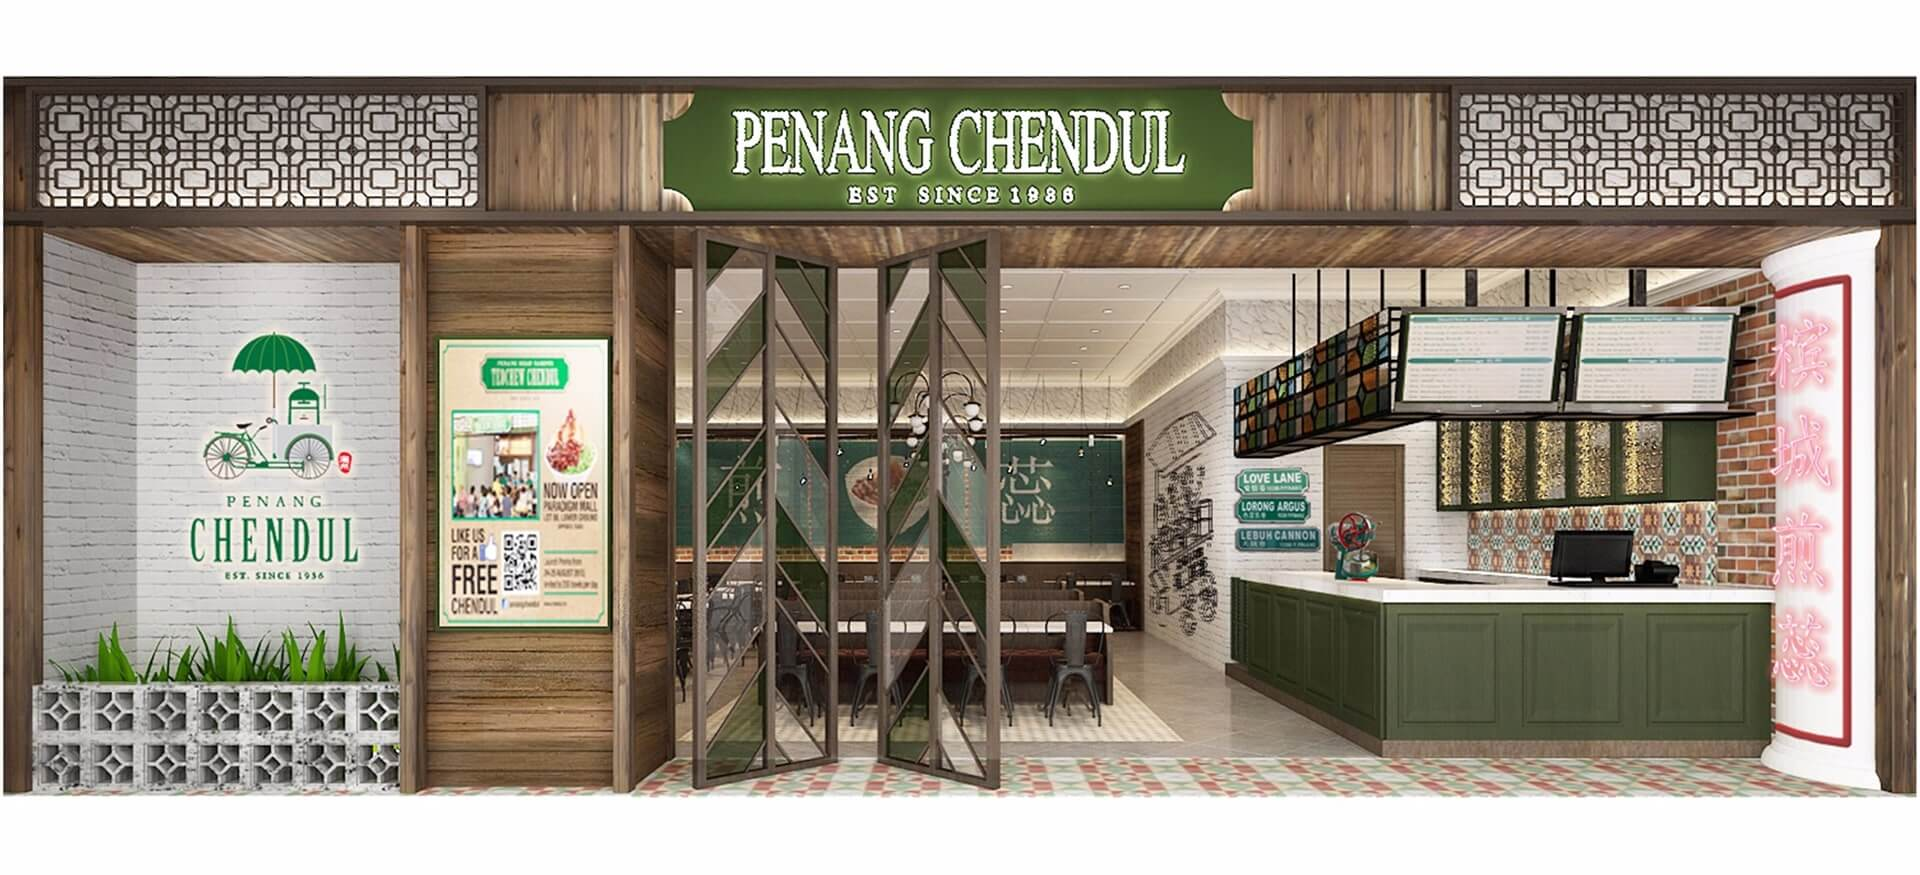 PENANG CHENDUL